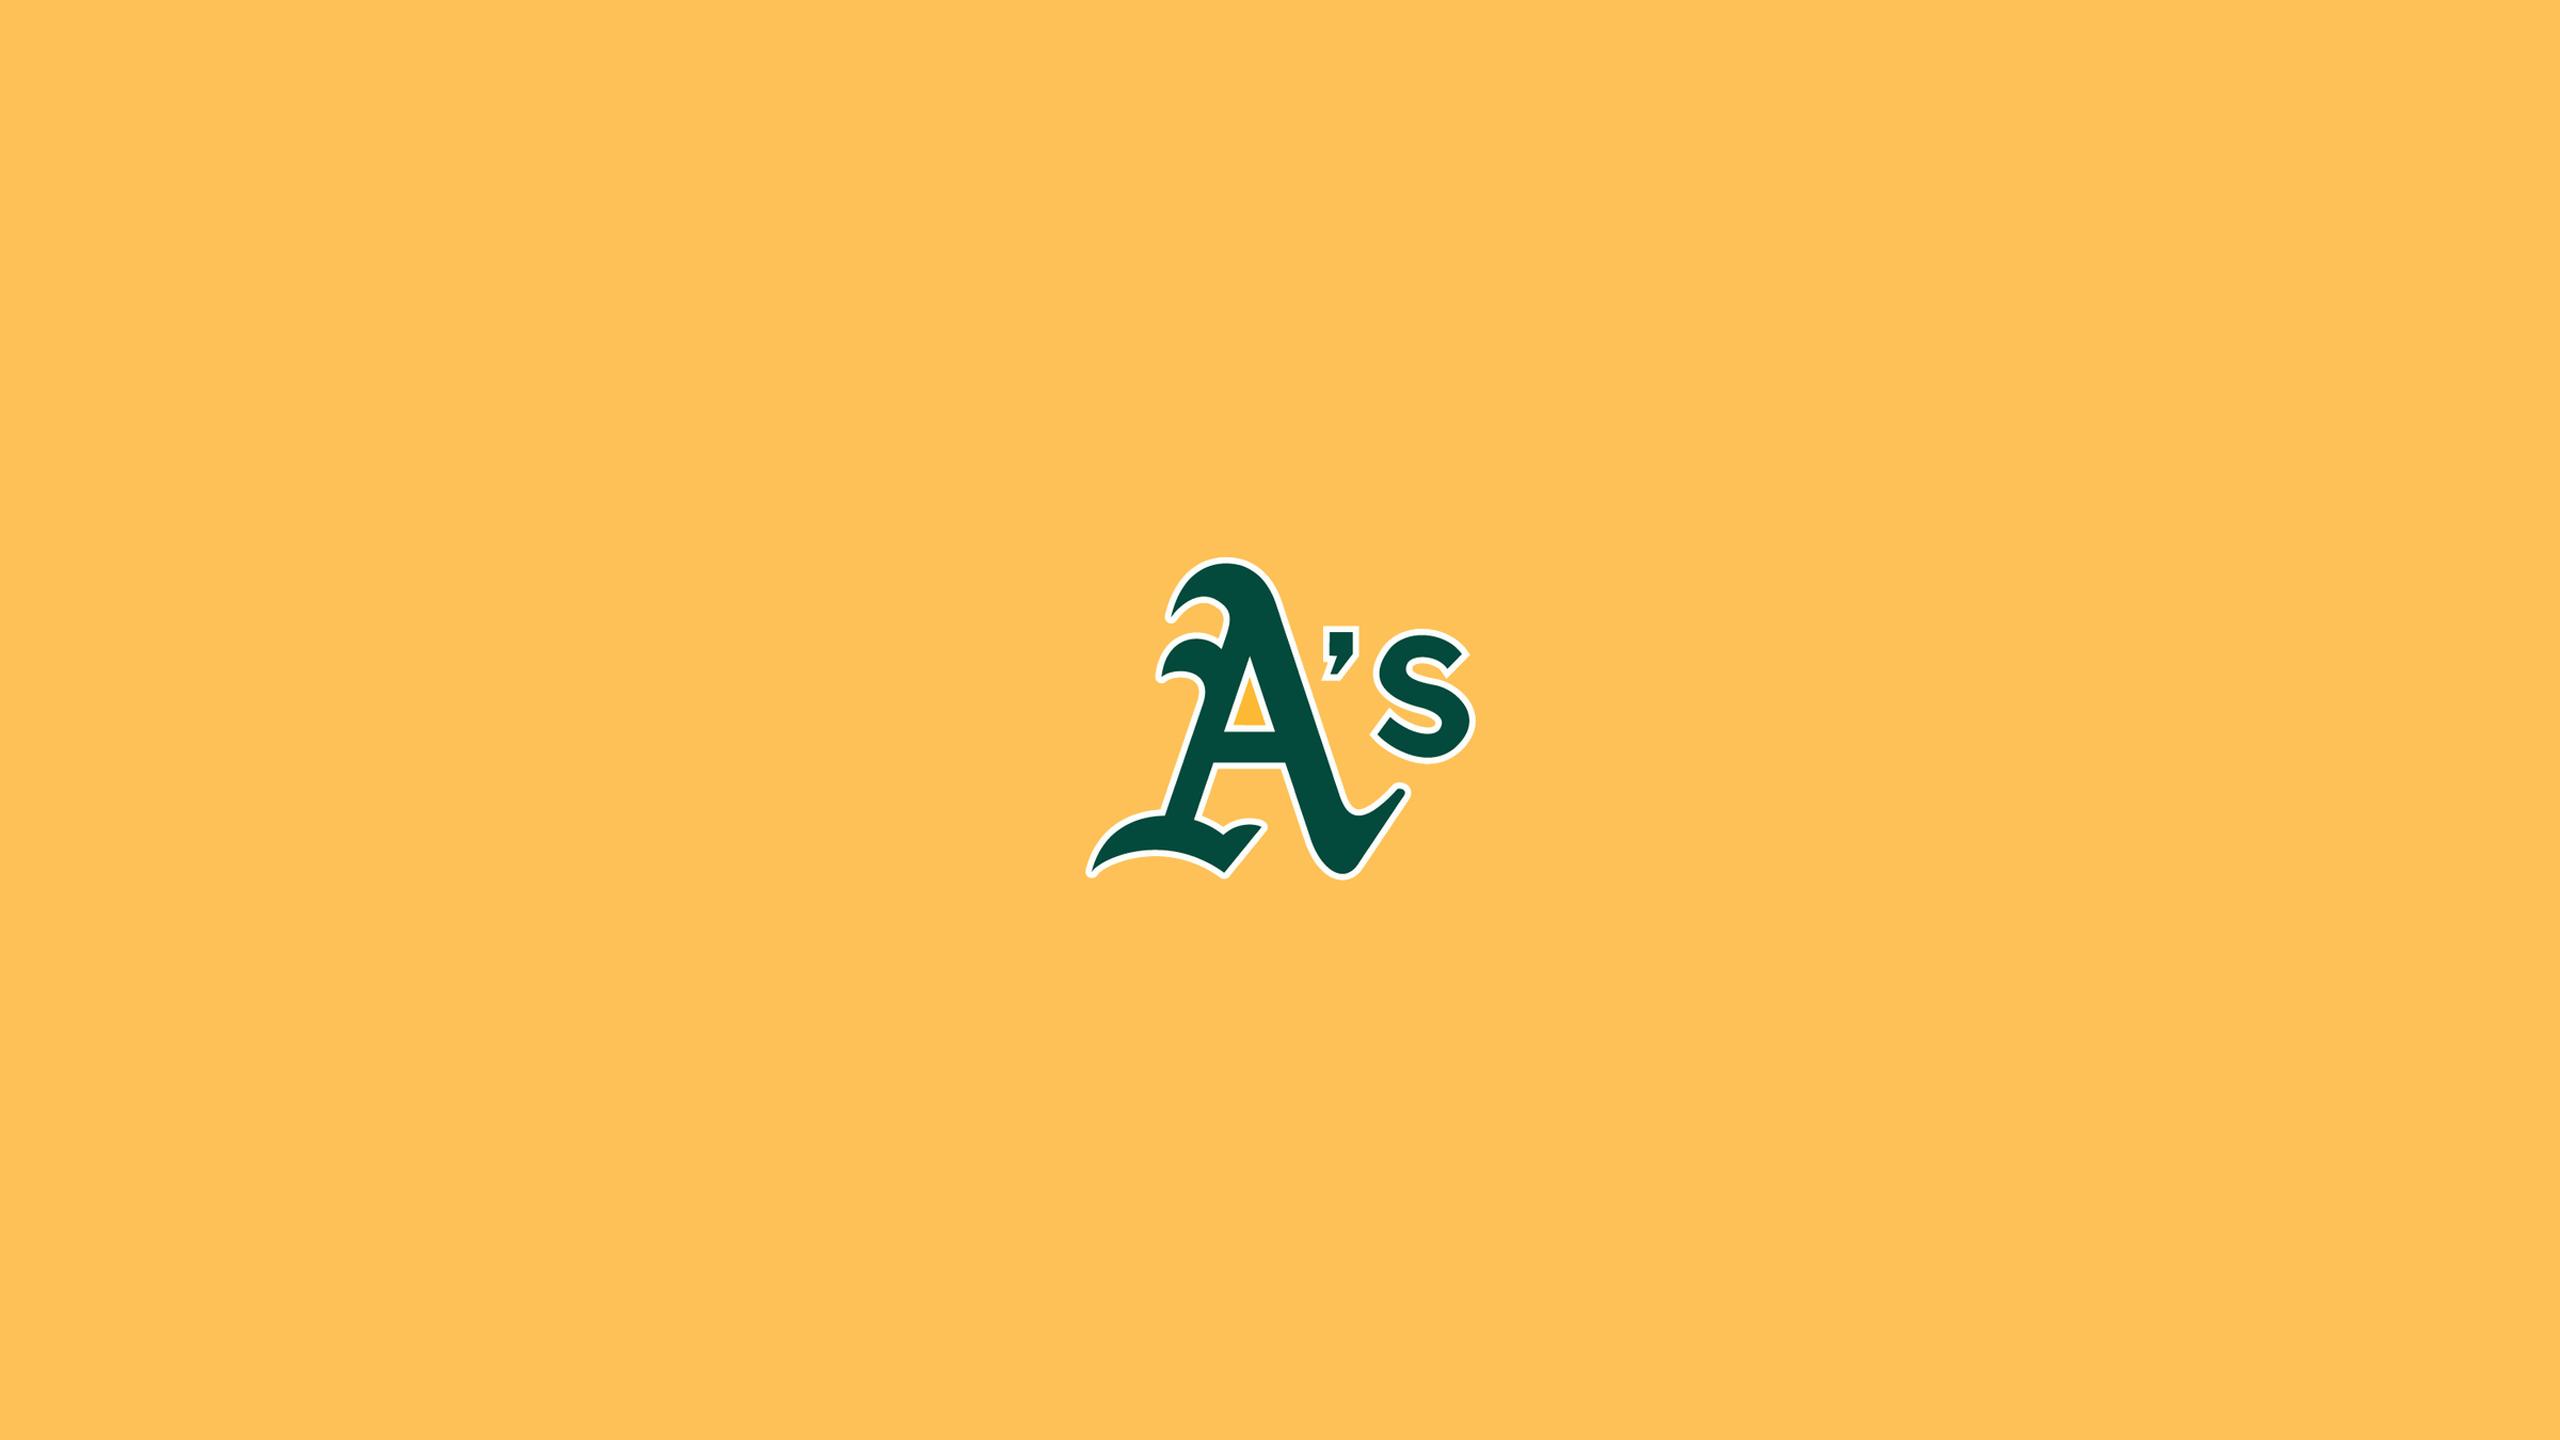 Oakland Athletics (Old School)